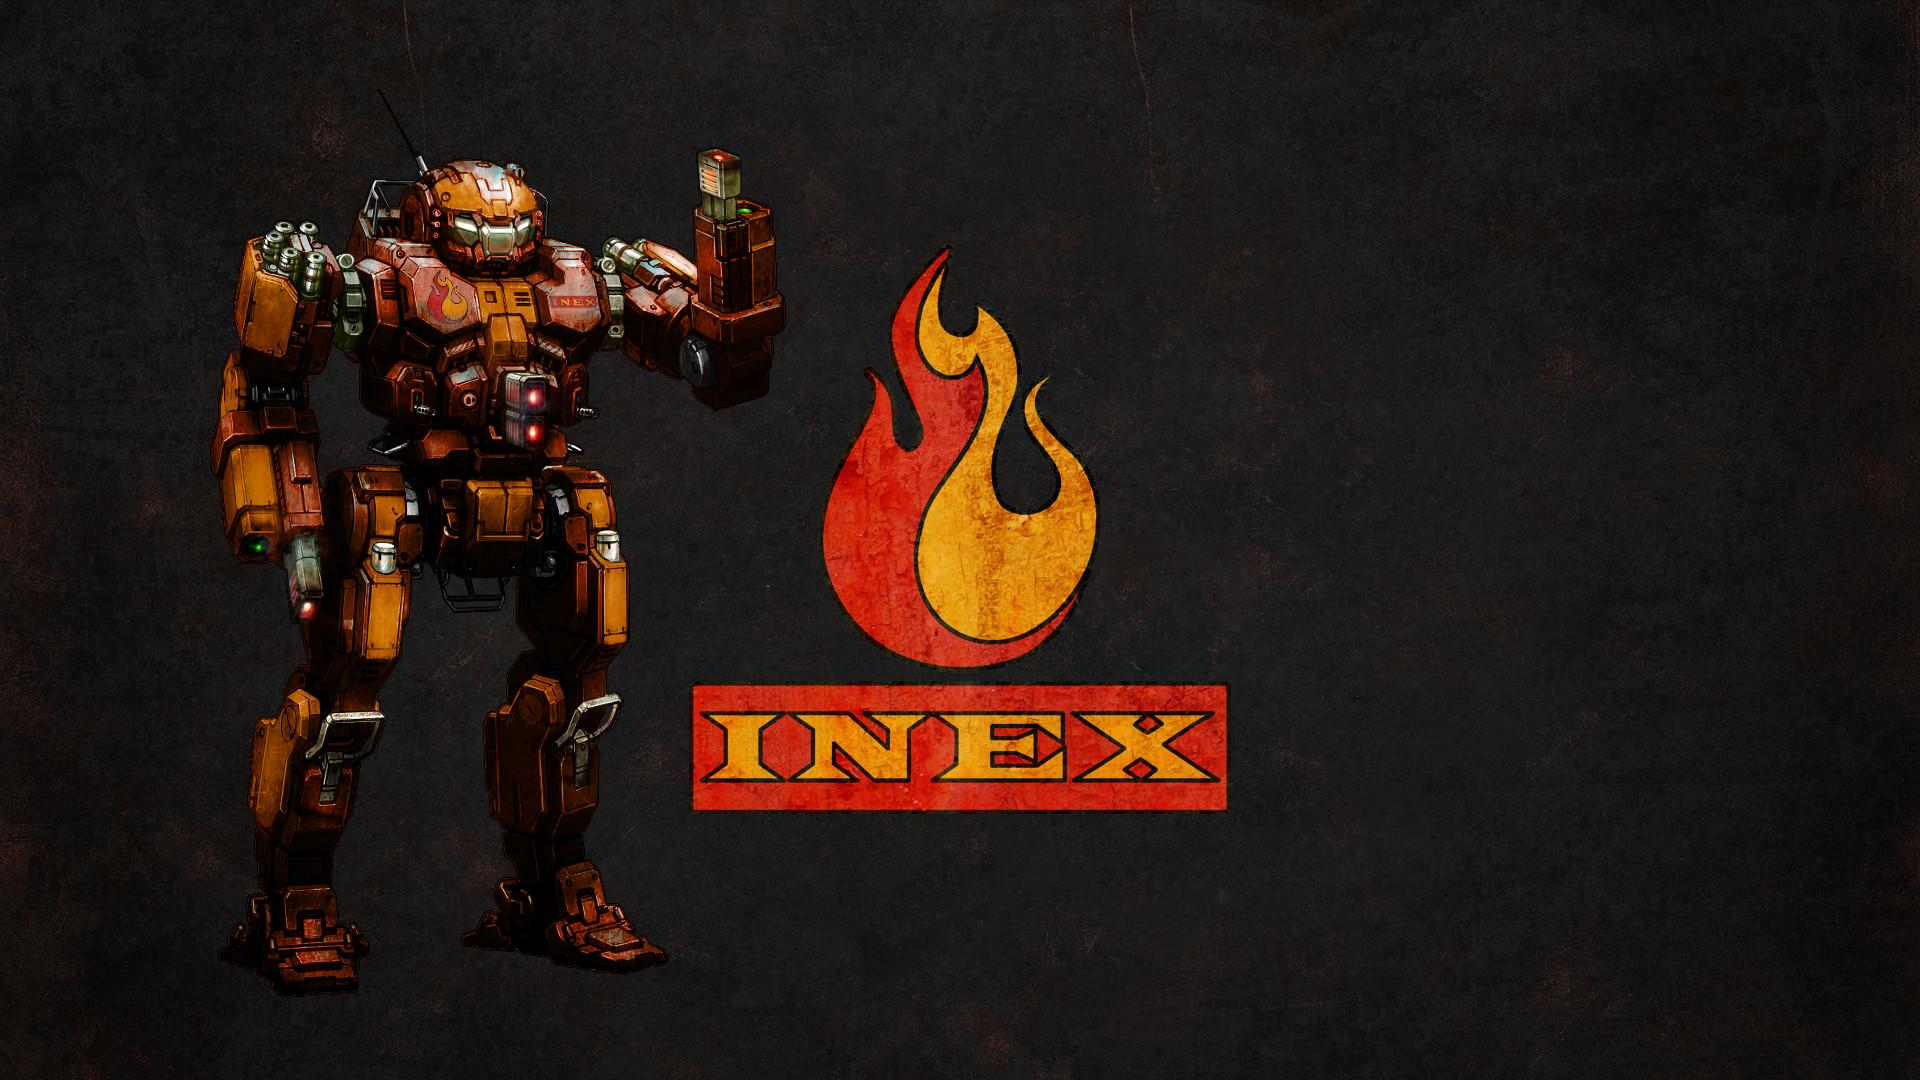 … Wallpaper MWO Firestarter and INEX logo by Odanan